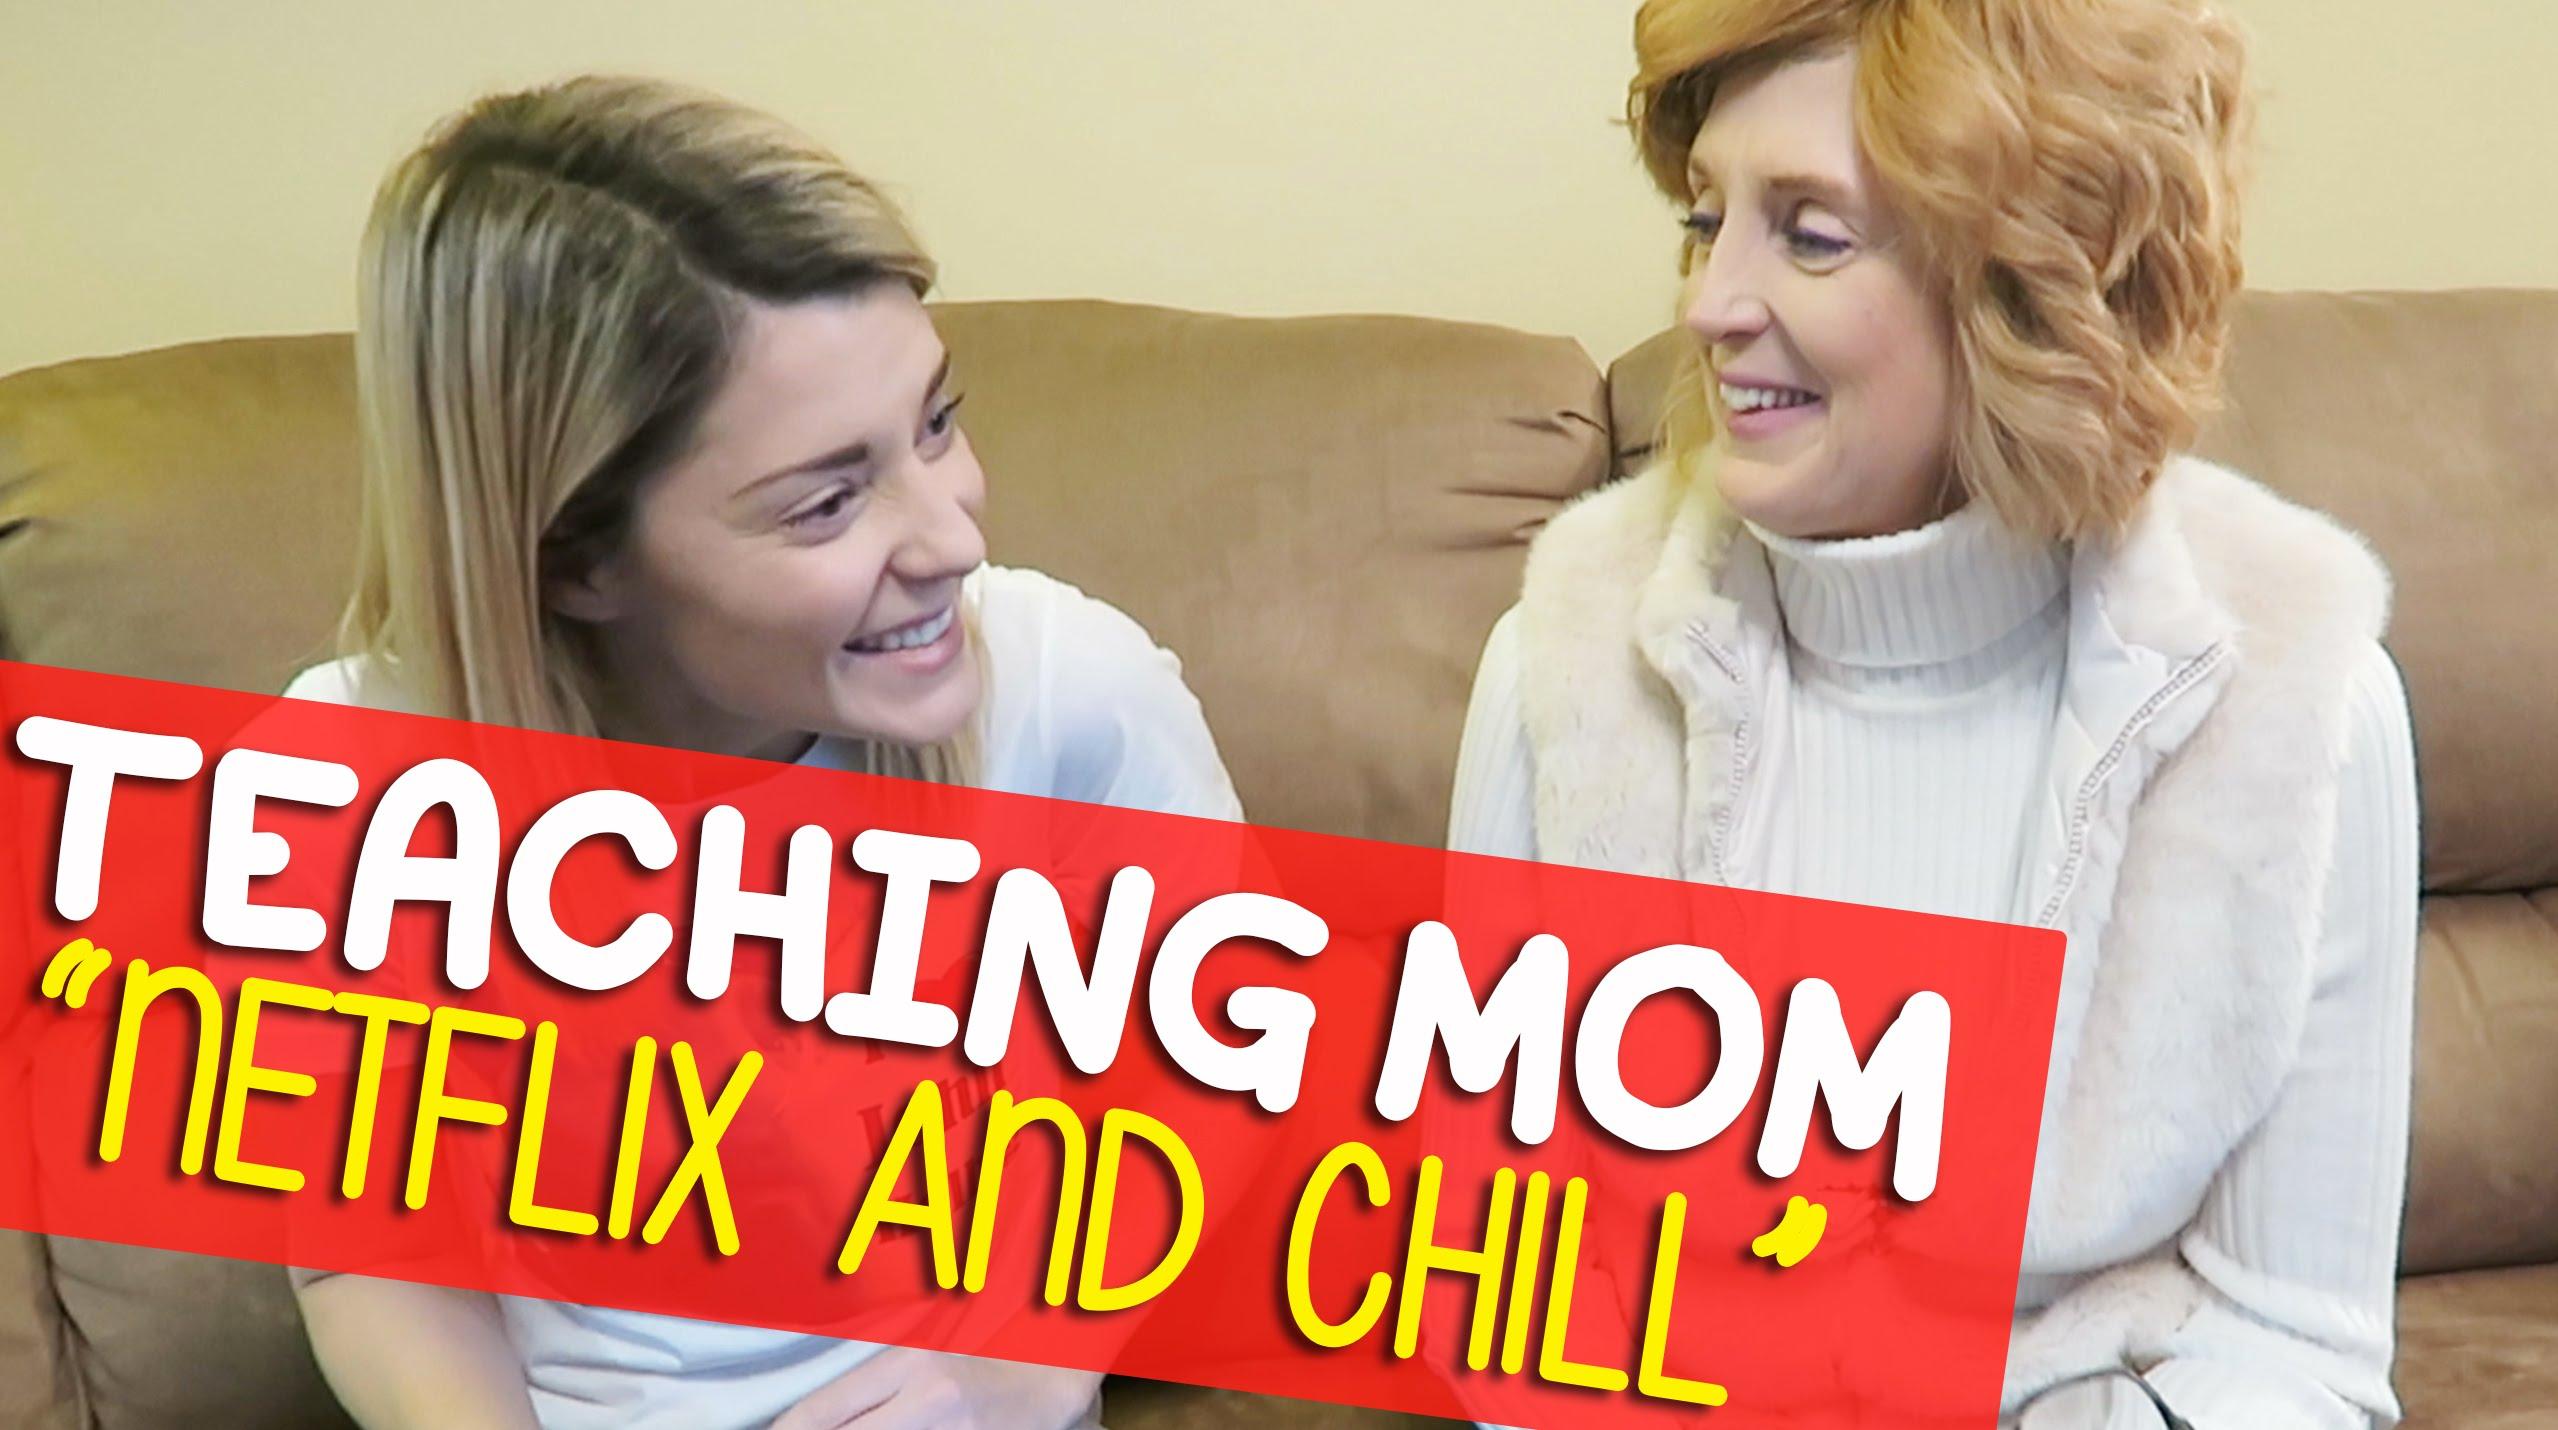 netflix mom